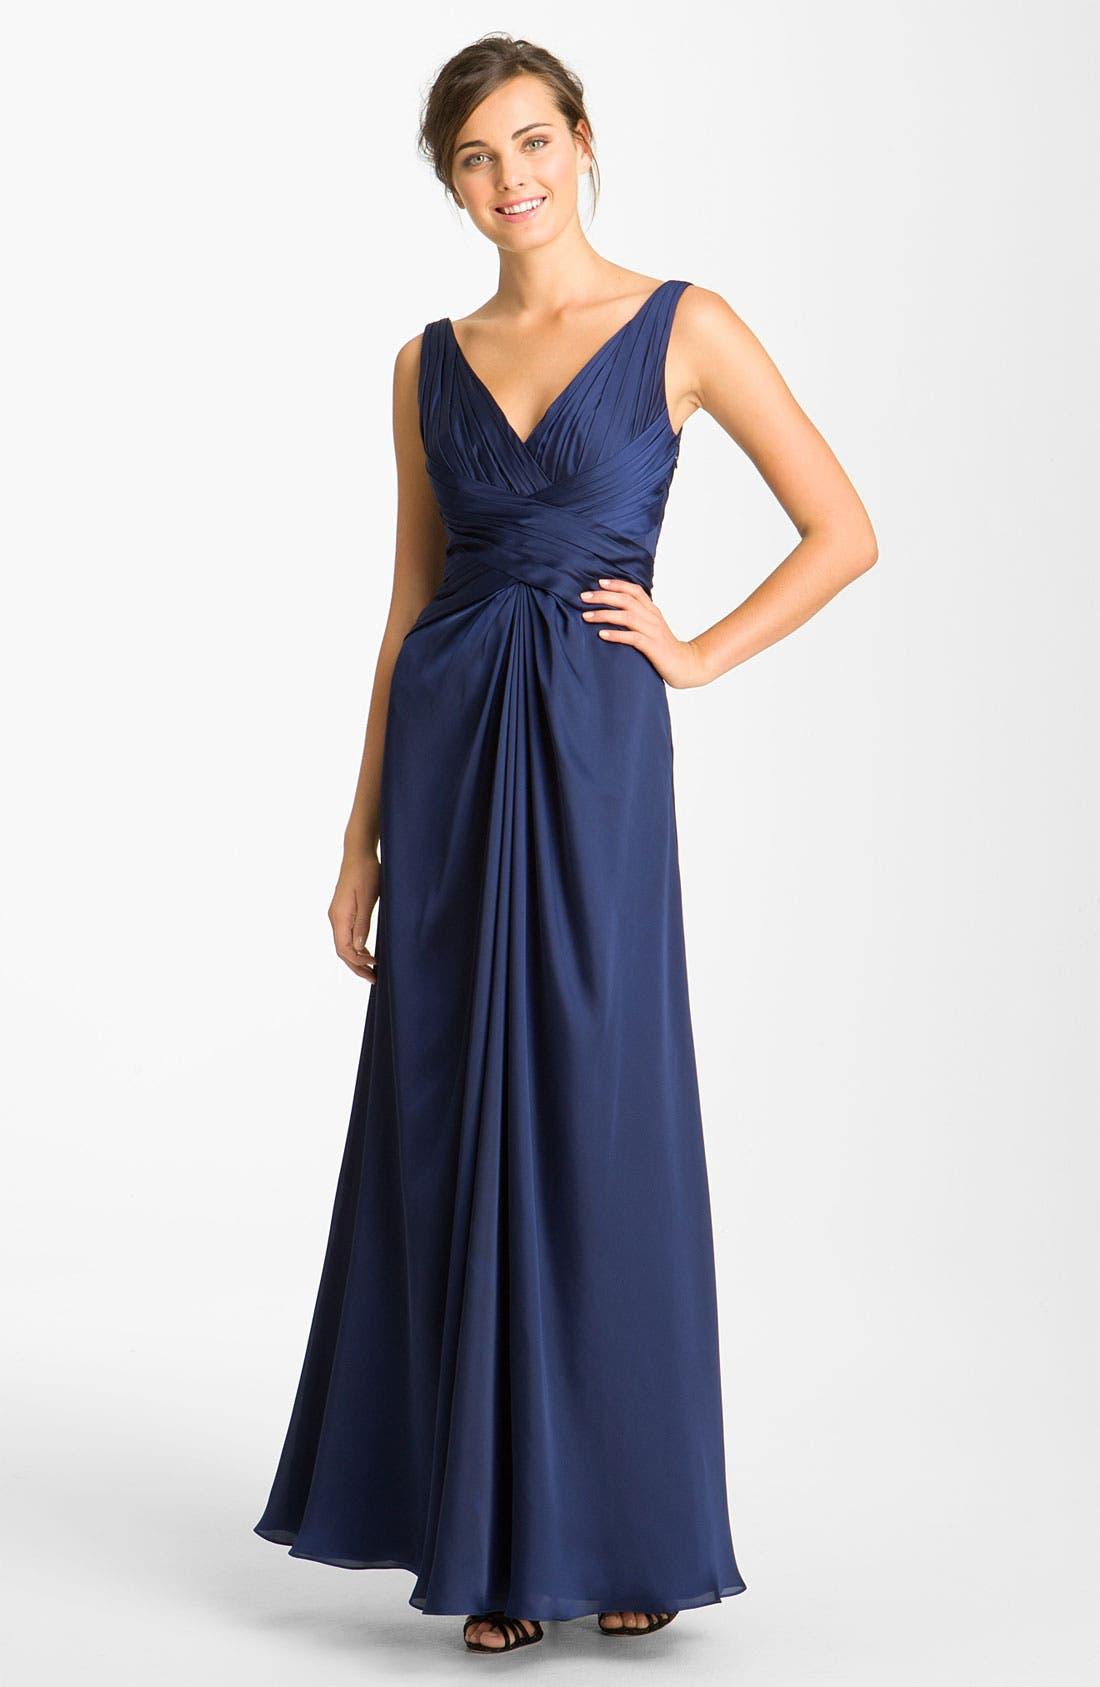 Main Image - ML Monique Lhuillier Bridesmaids V-Neck Charmeuse Gown (Nordstrom Exclusive)